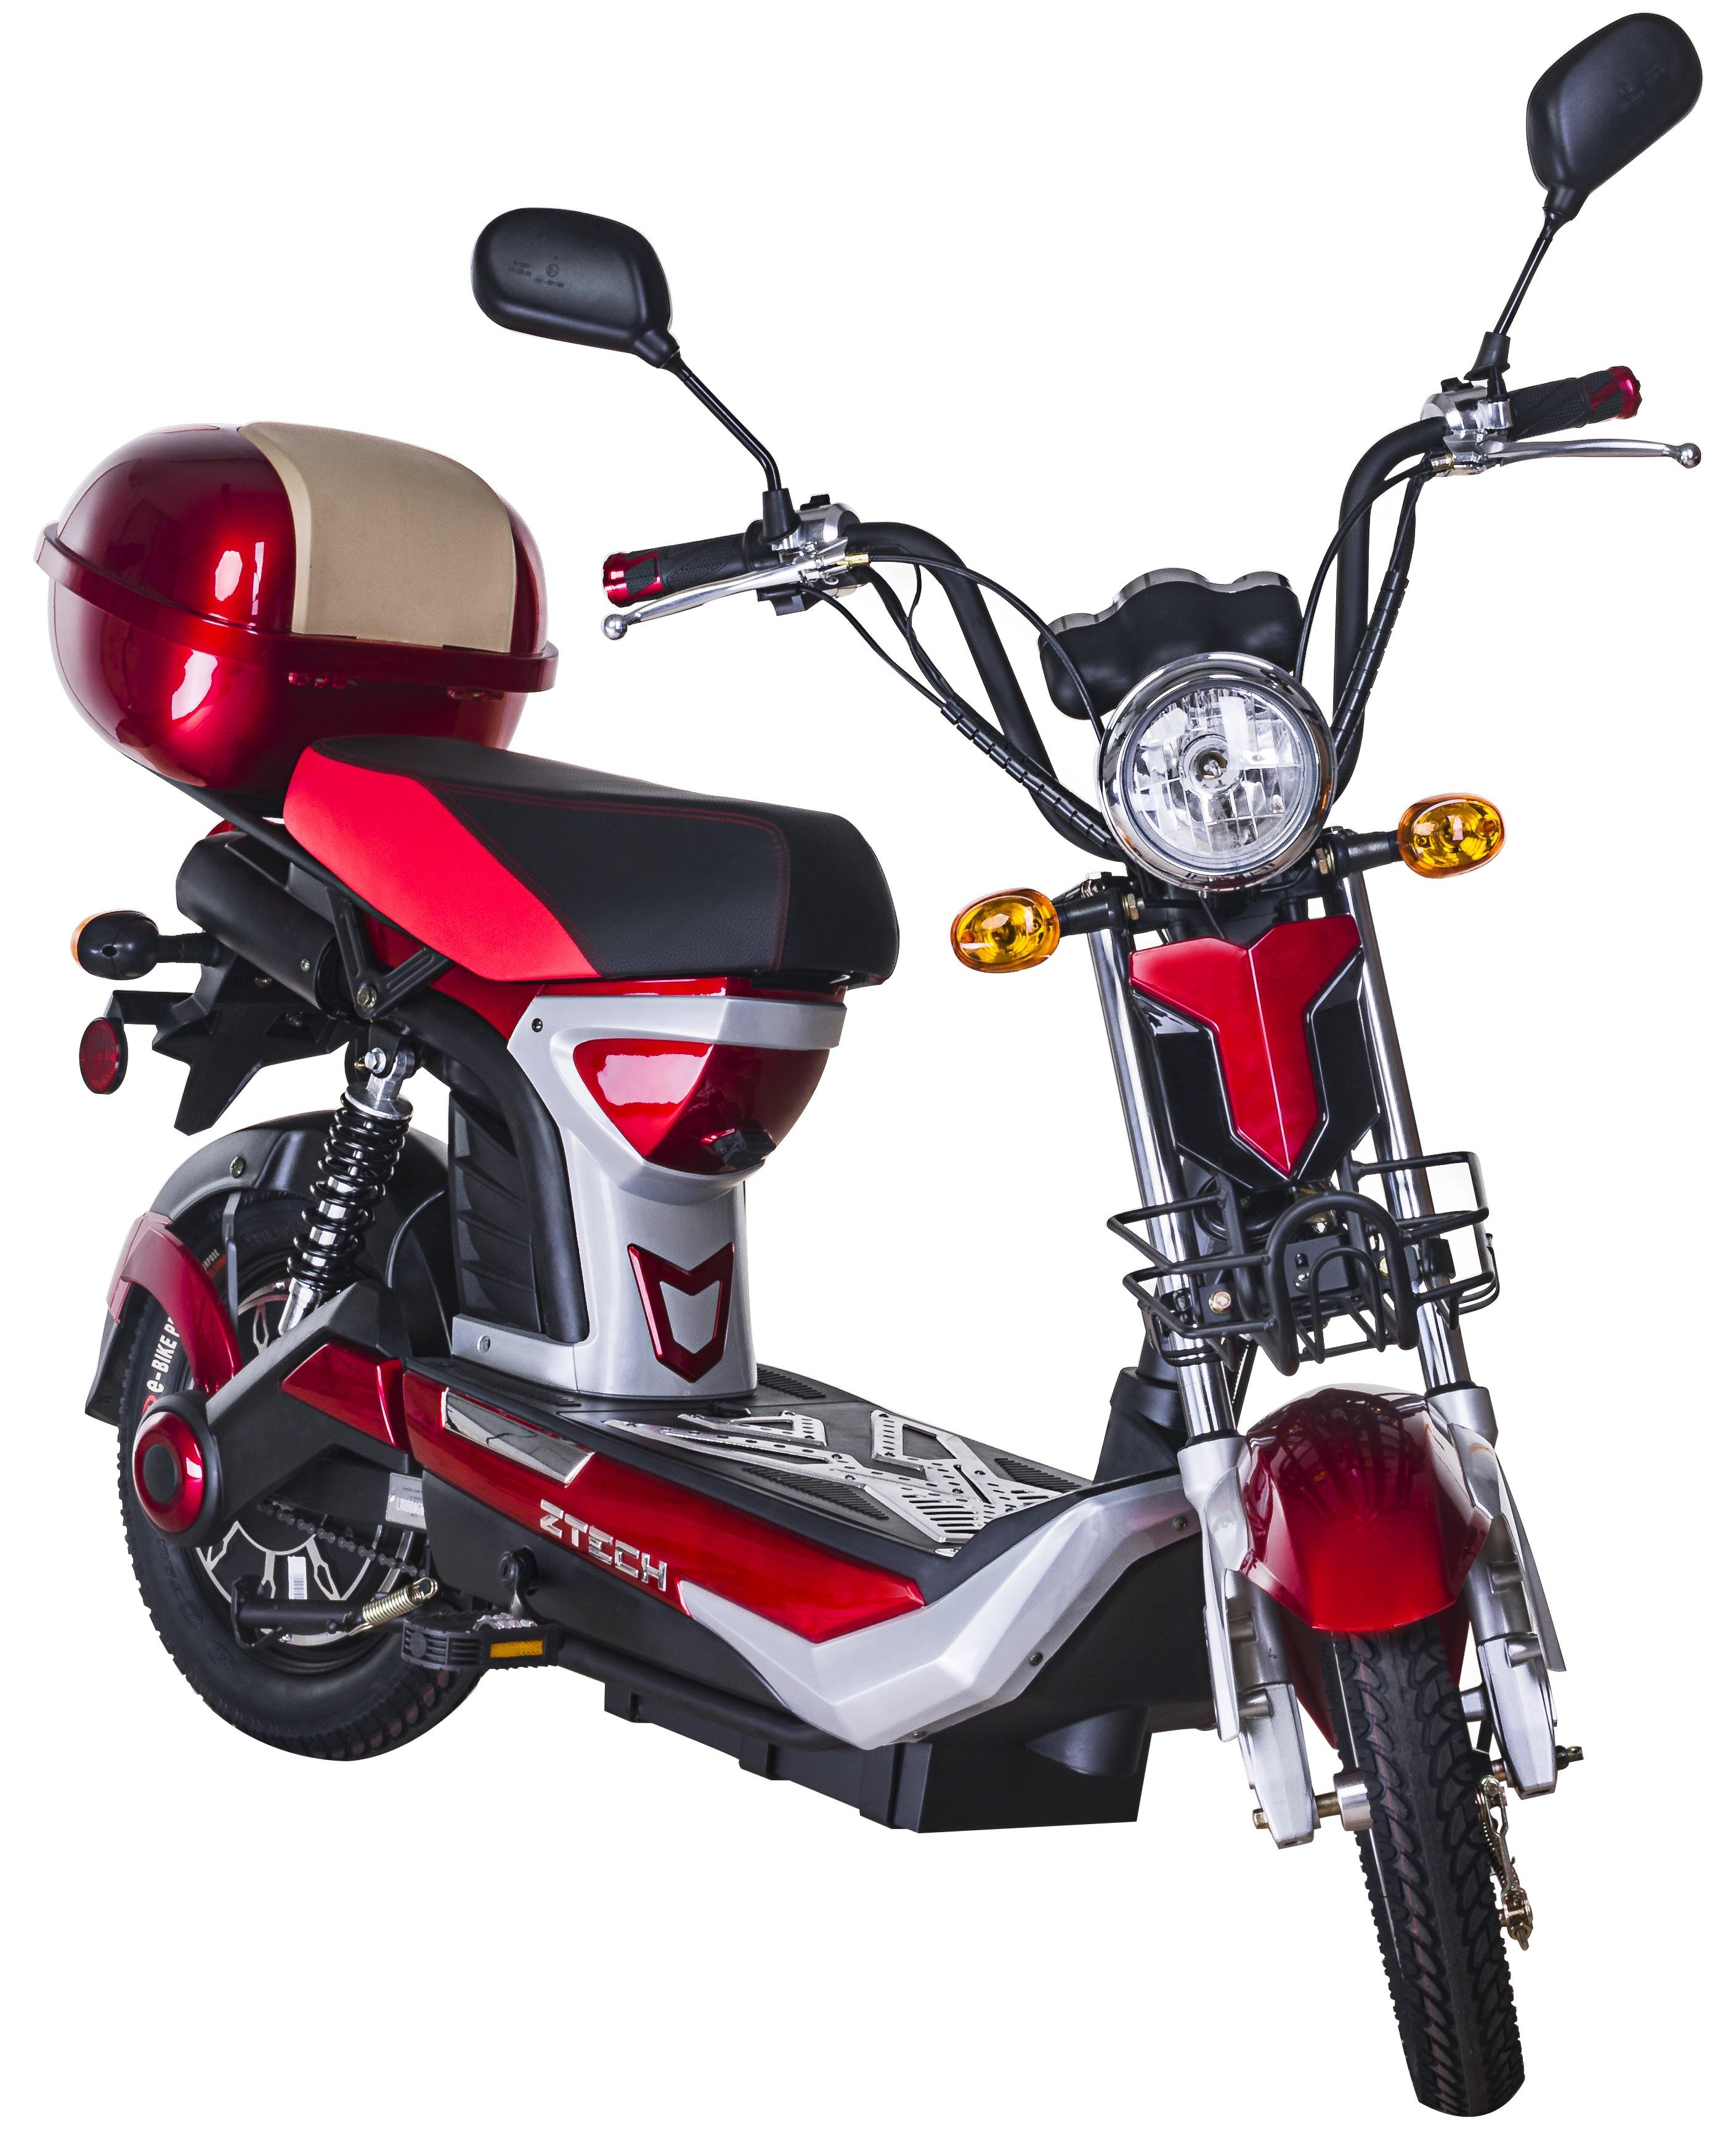 Bicicleta electrica Ztech ZT-04 Pizza 1.0